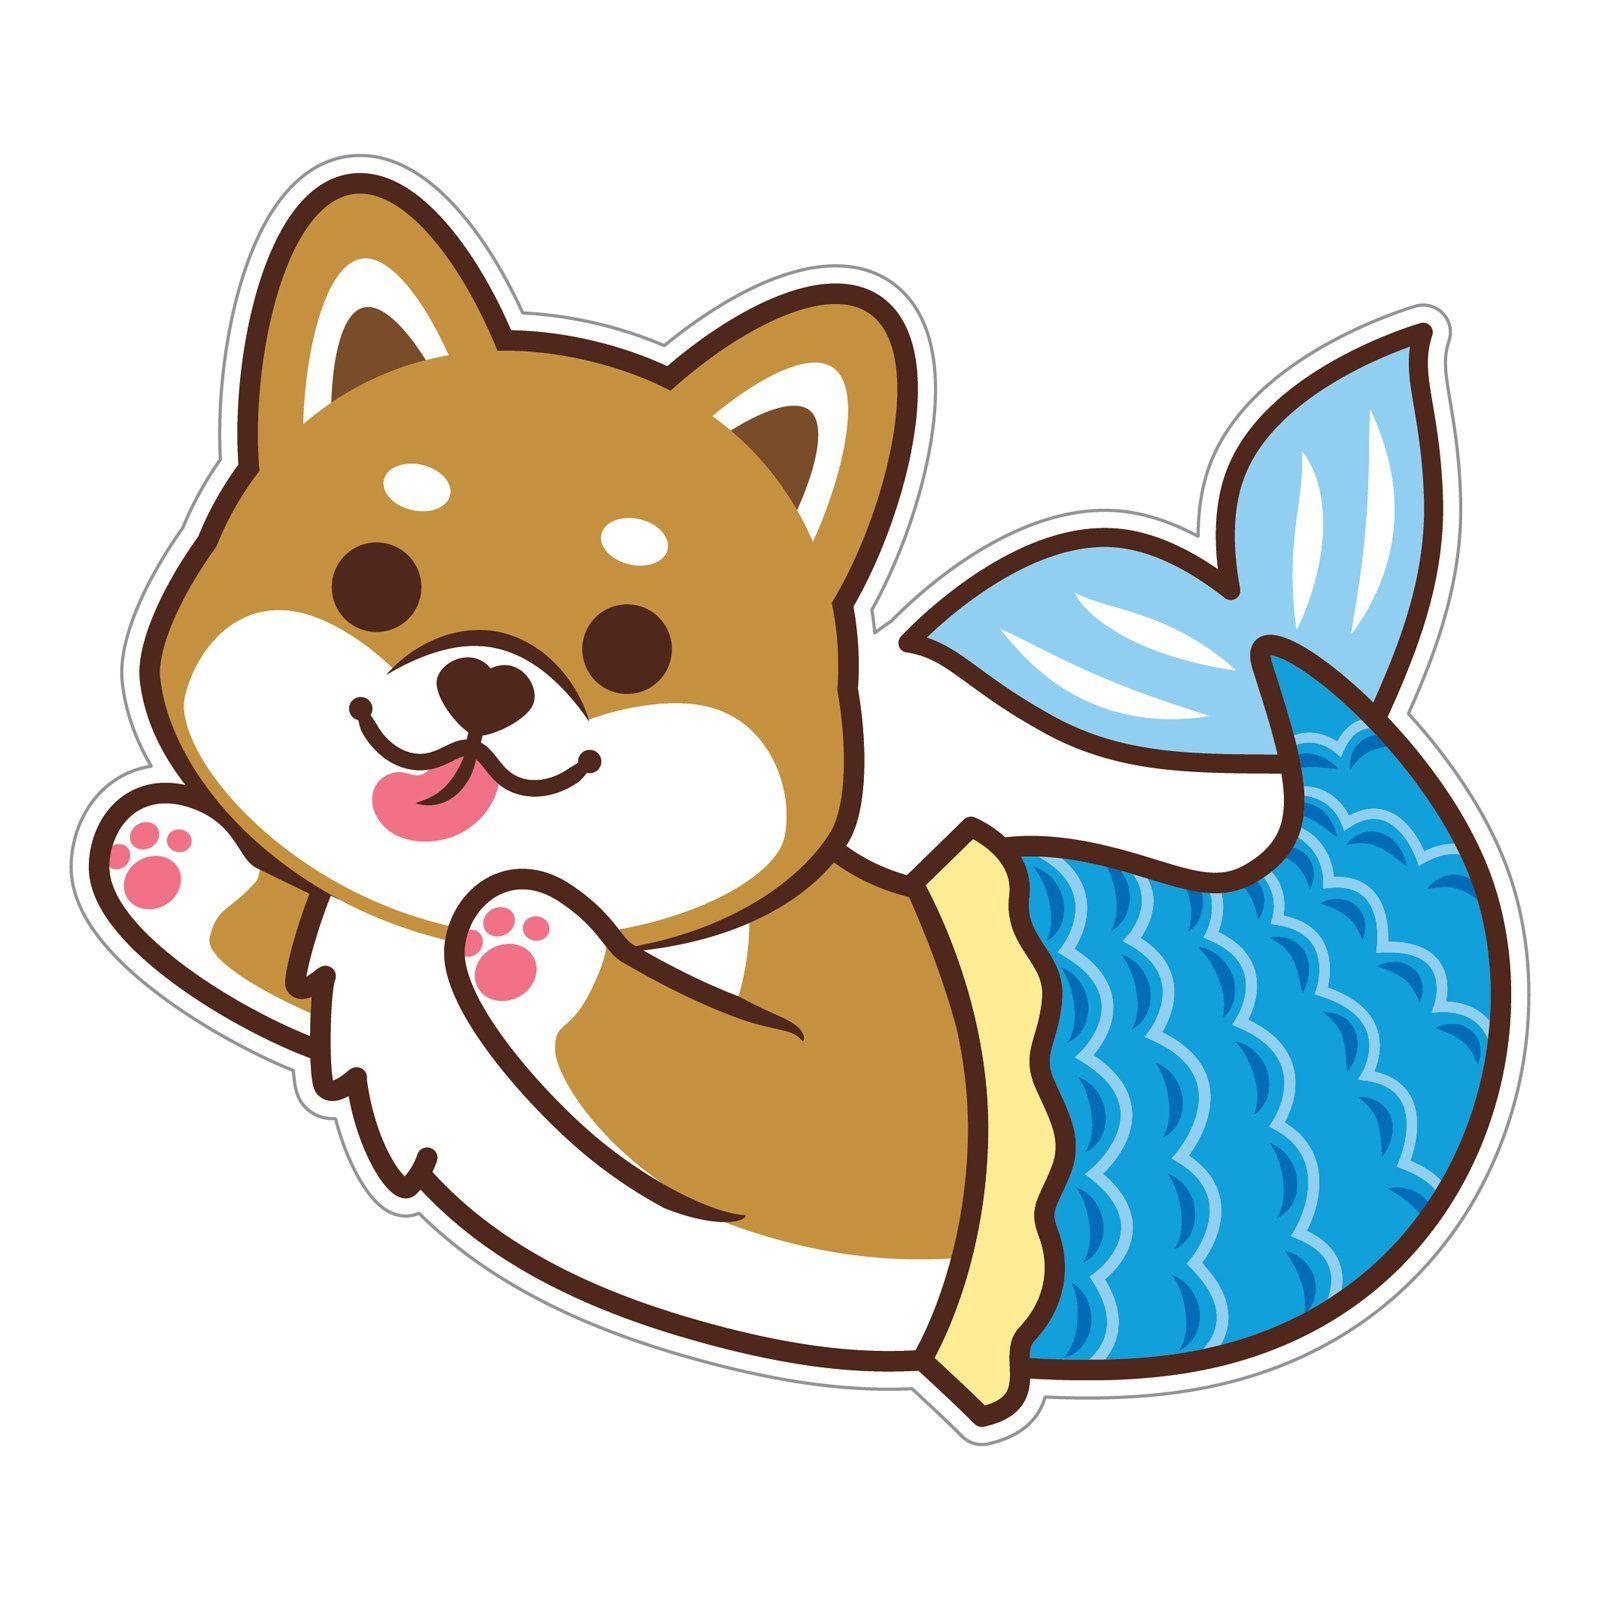 SHIBA INU MERMAID STICKER Mermaid sticker, Cute stickers